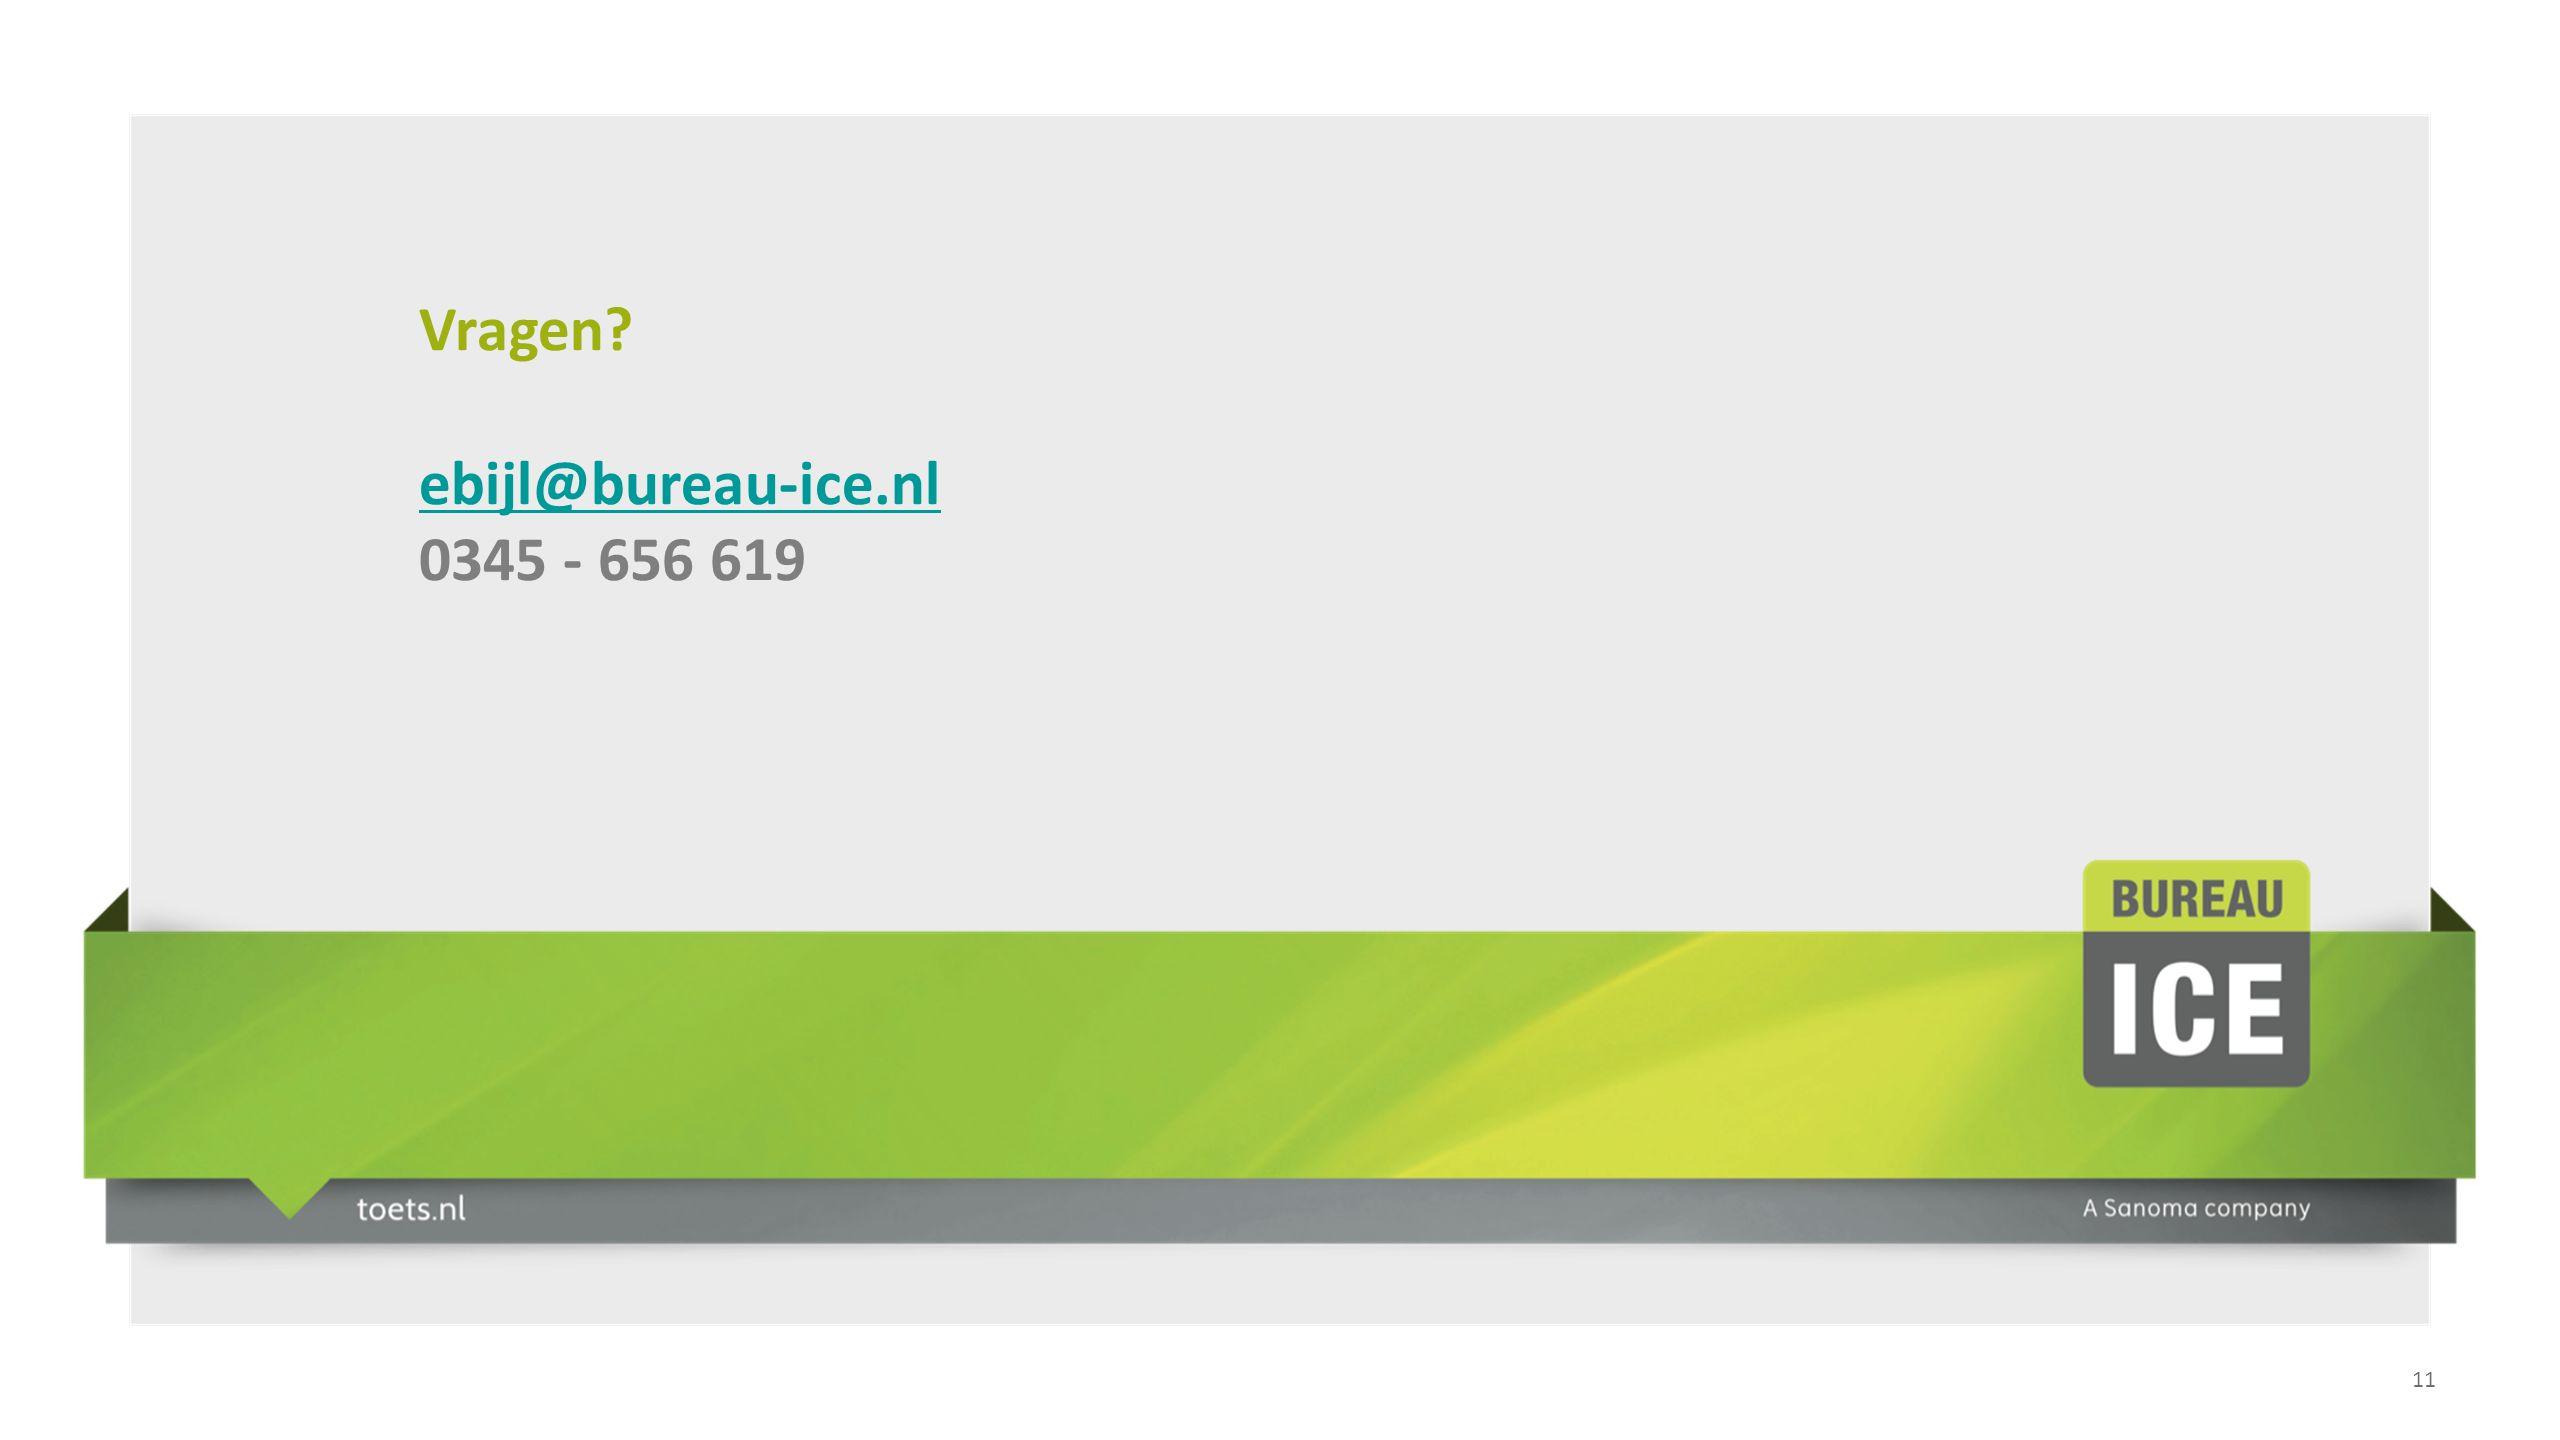 11 Vragen? ebijl@bureau-ice.nl 0345 - 656 619